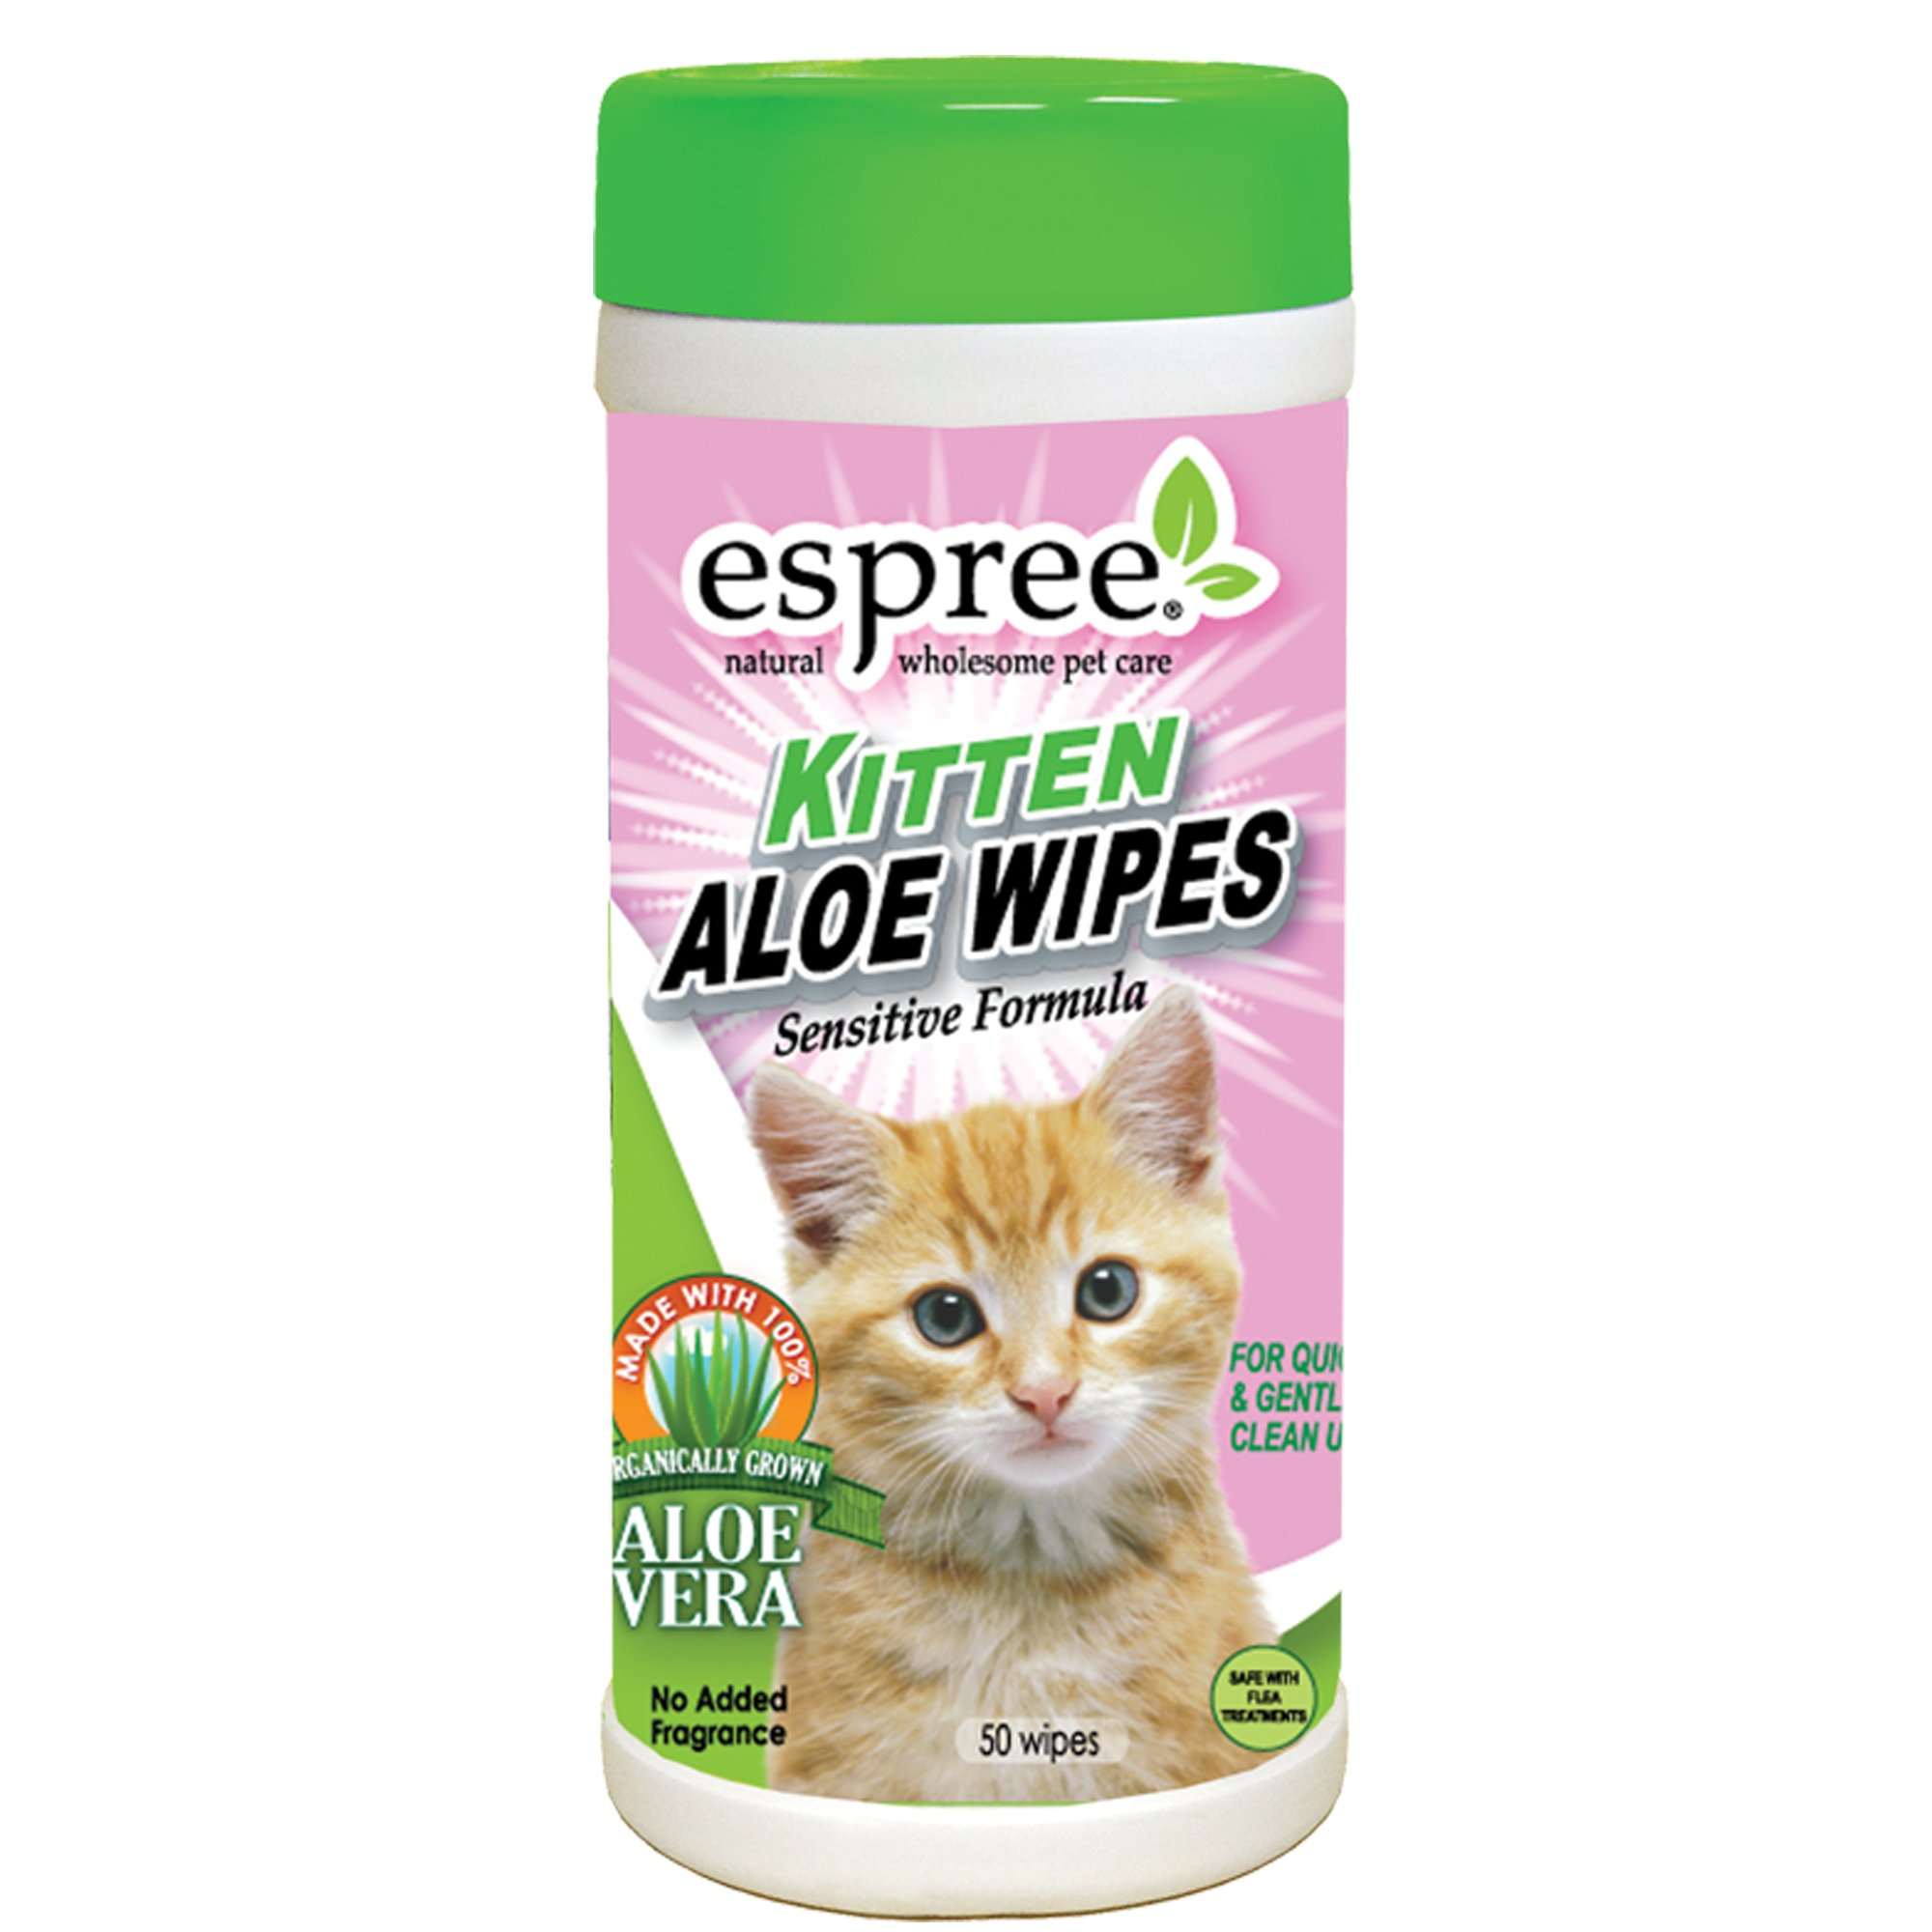 Espree Kitten Aloe Wipes 50 Count Petco In 2020 Kitten Petco Aloe